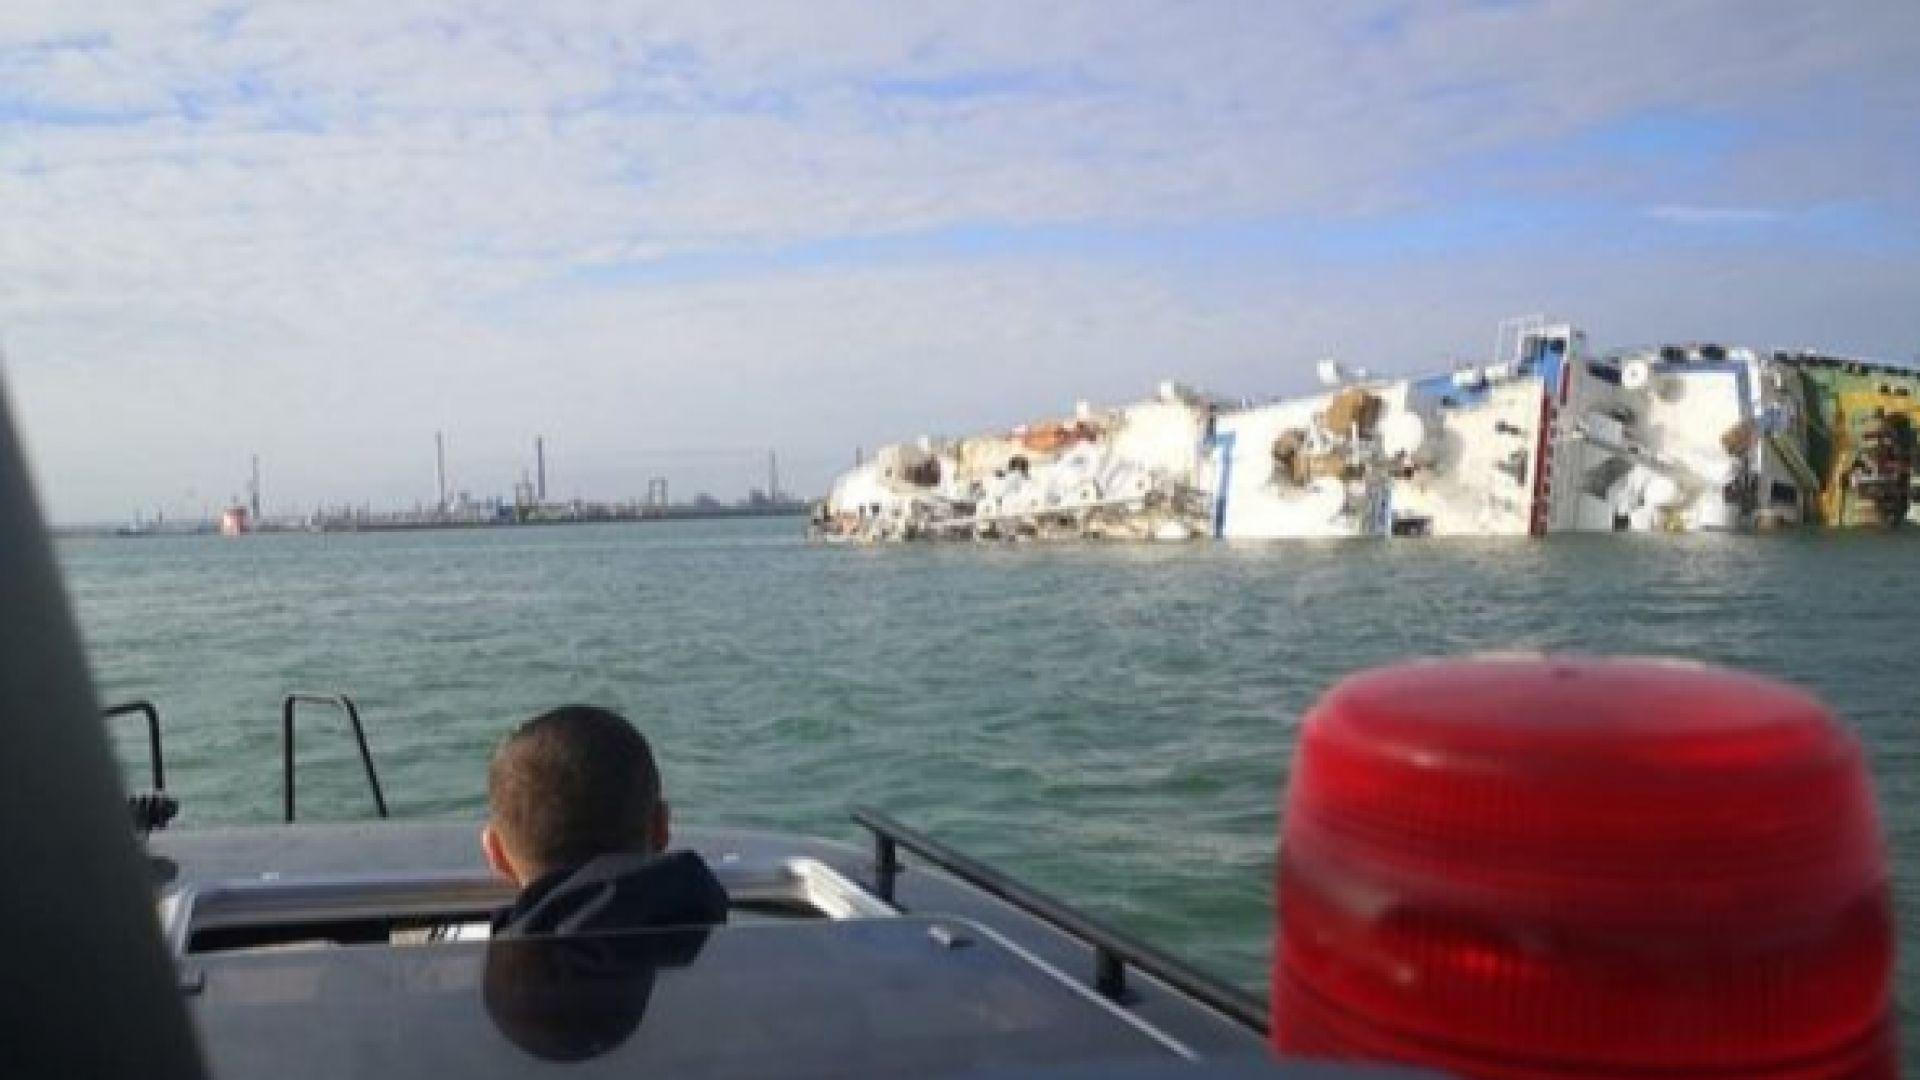 Кораб, превозващ над 14 000 овце, се обърна в румънско пристанище